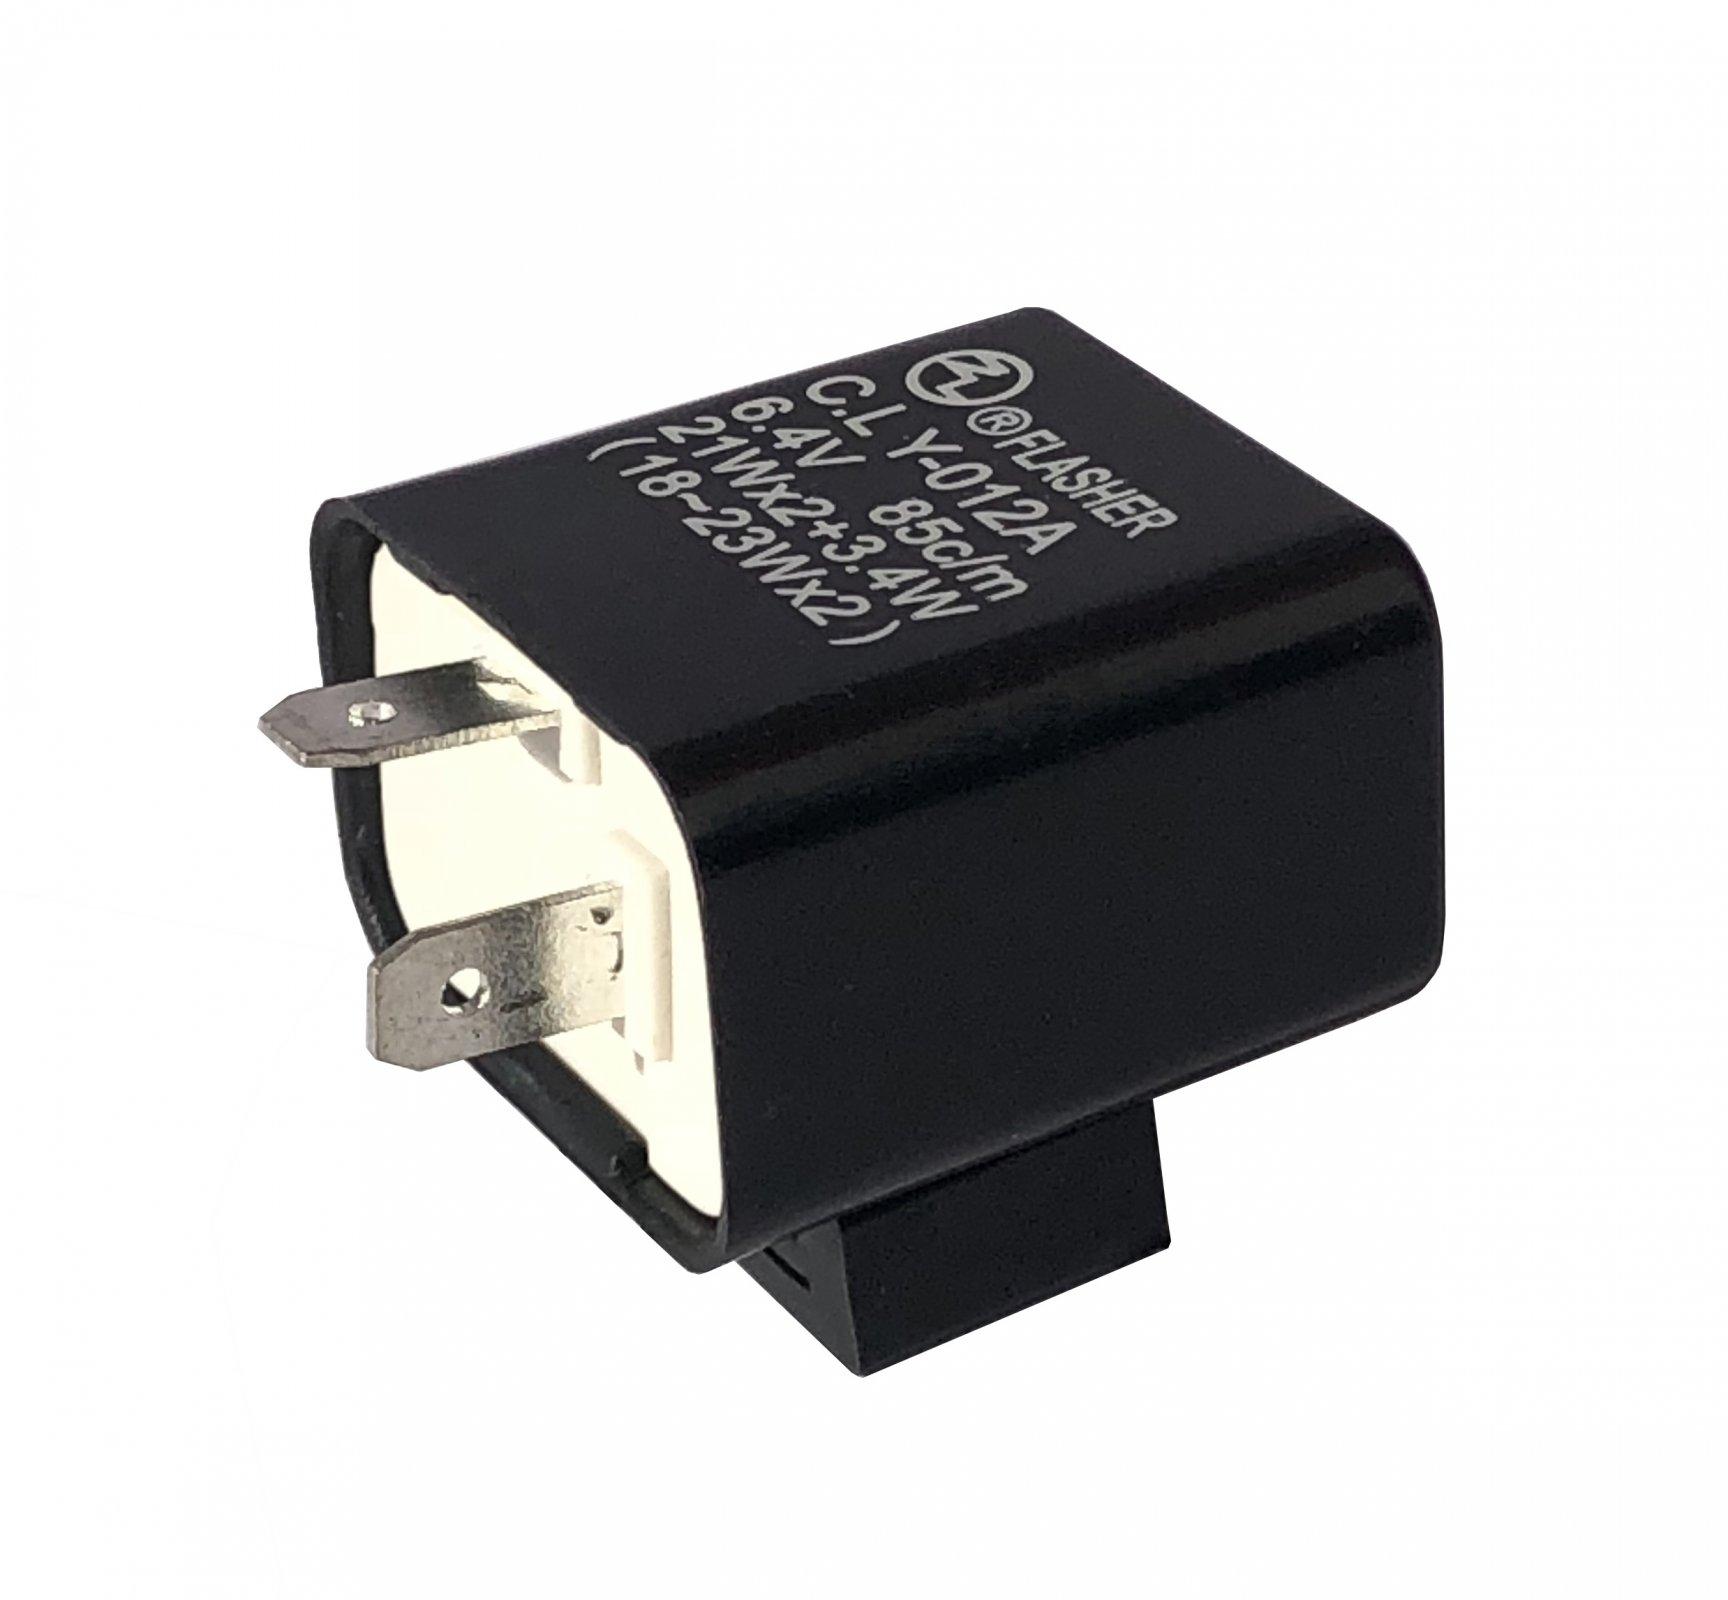 hight resolution of yamaha xt500 6v 2 pin flasher relay fz636sd 12 021